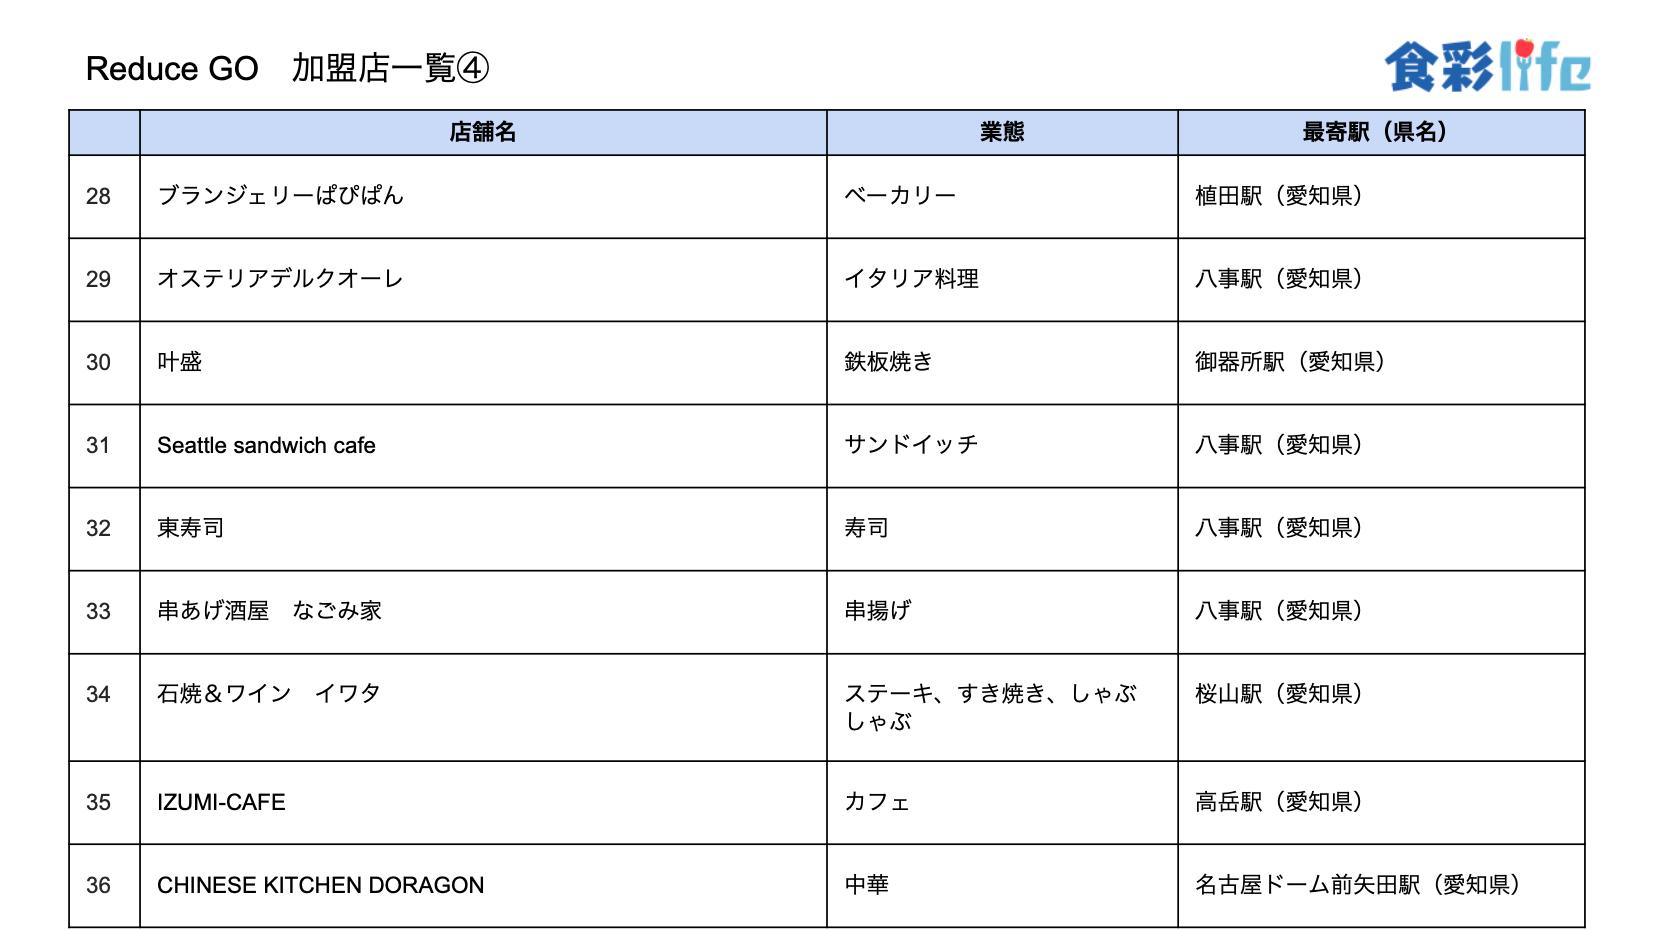 「ReduceGo」加盟店一覧4 (2020.3.18)